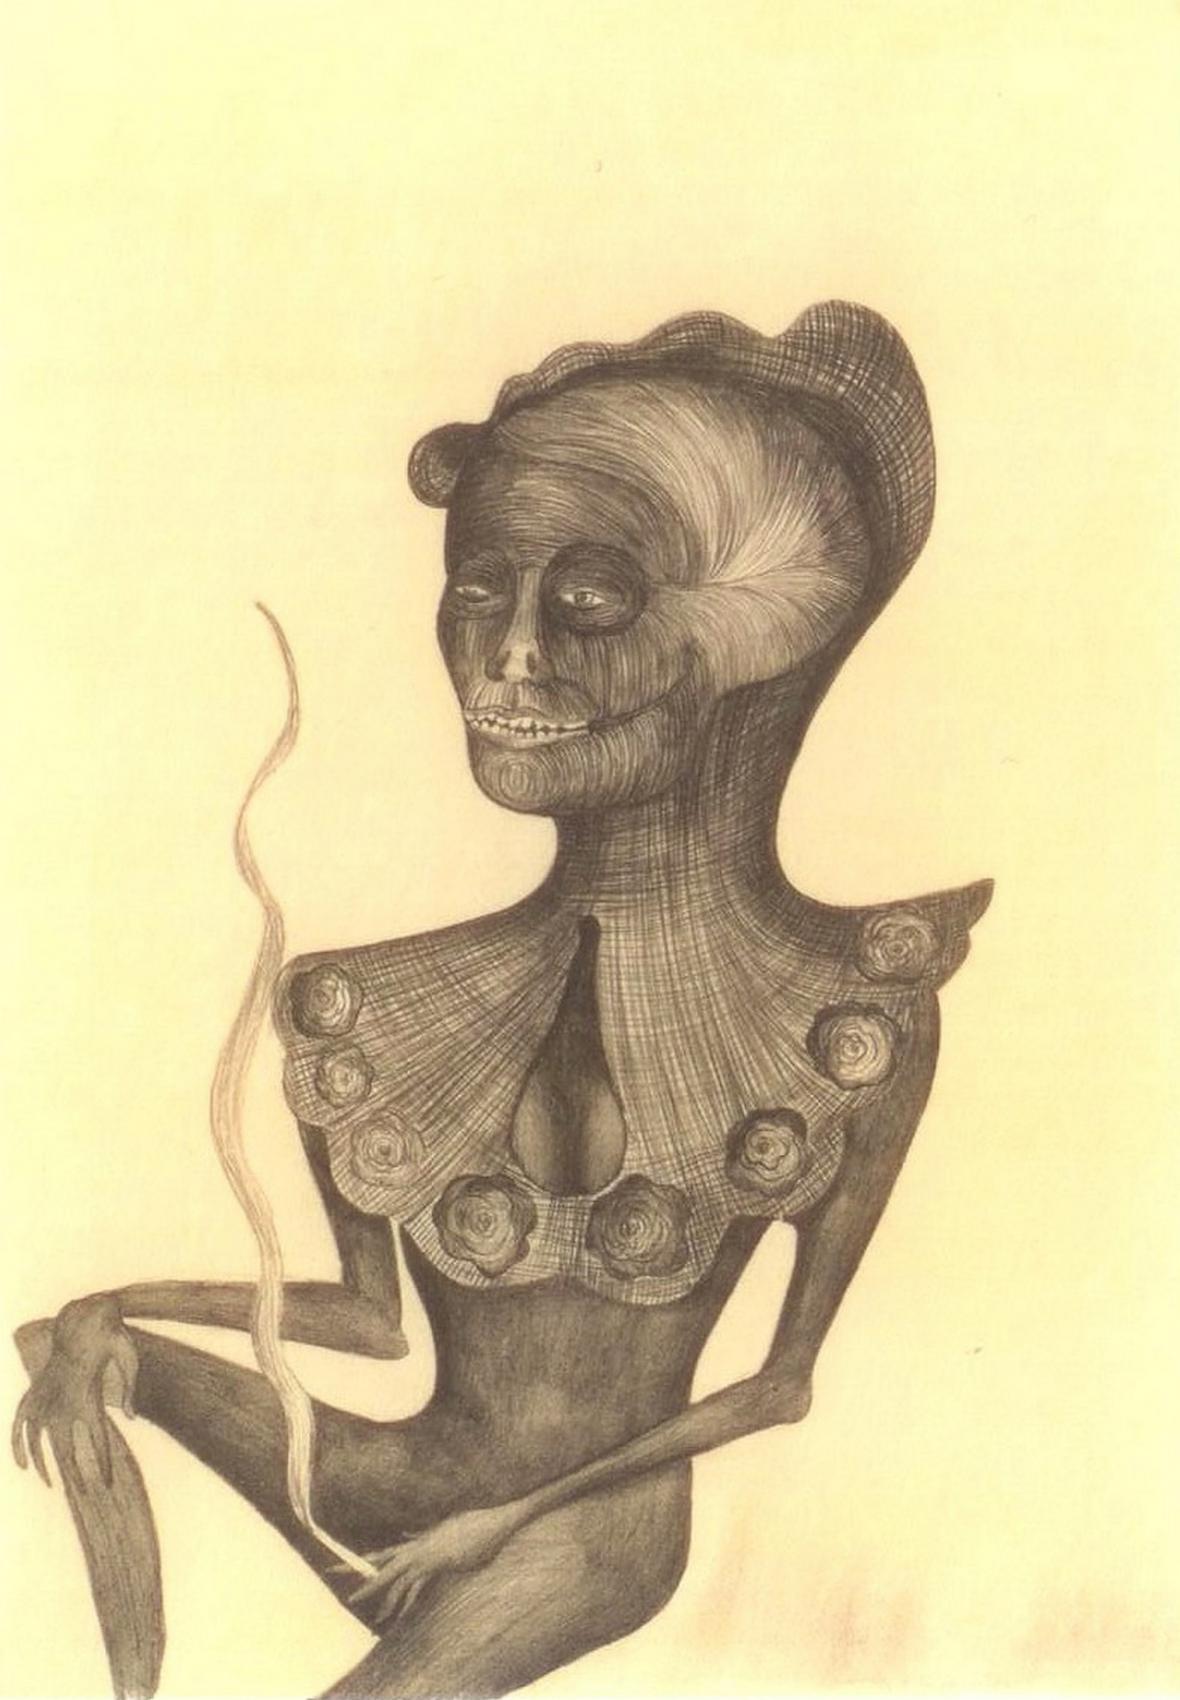 Sandra Vásquez de la Horra / Dáma všech záhad (La dama de los misterios), 2014